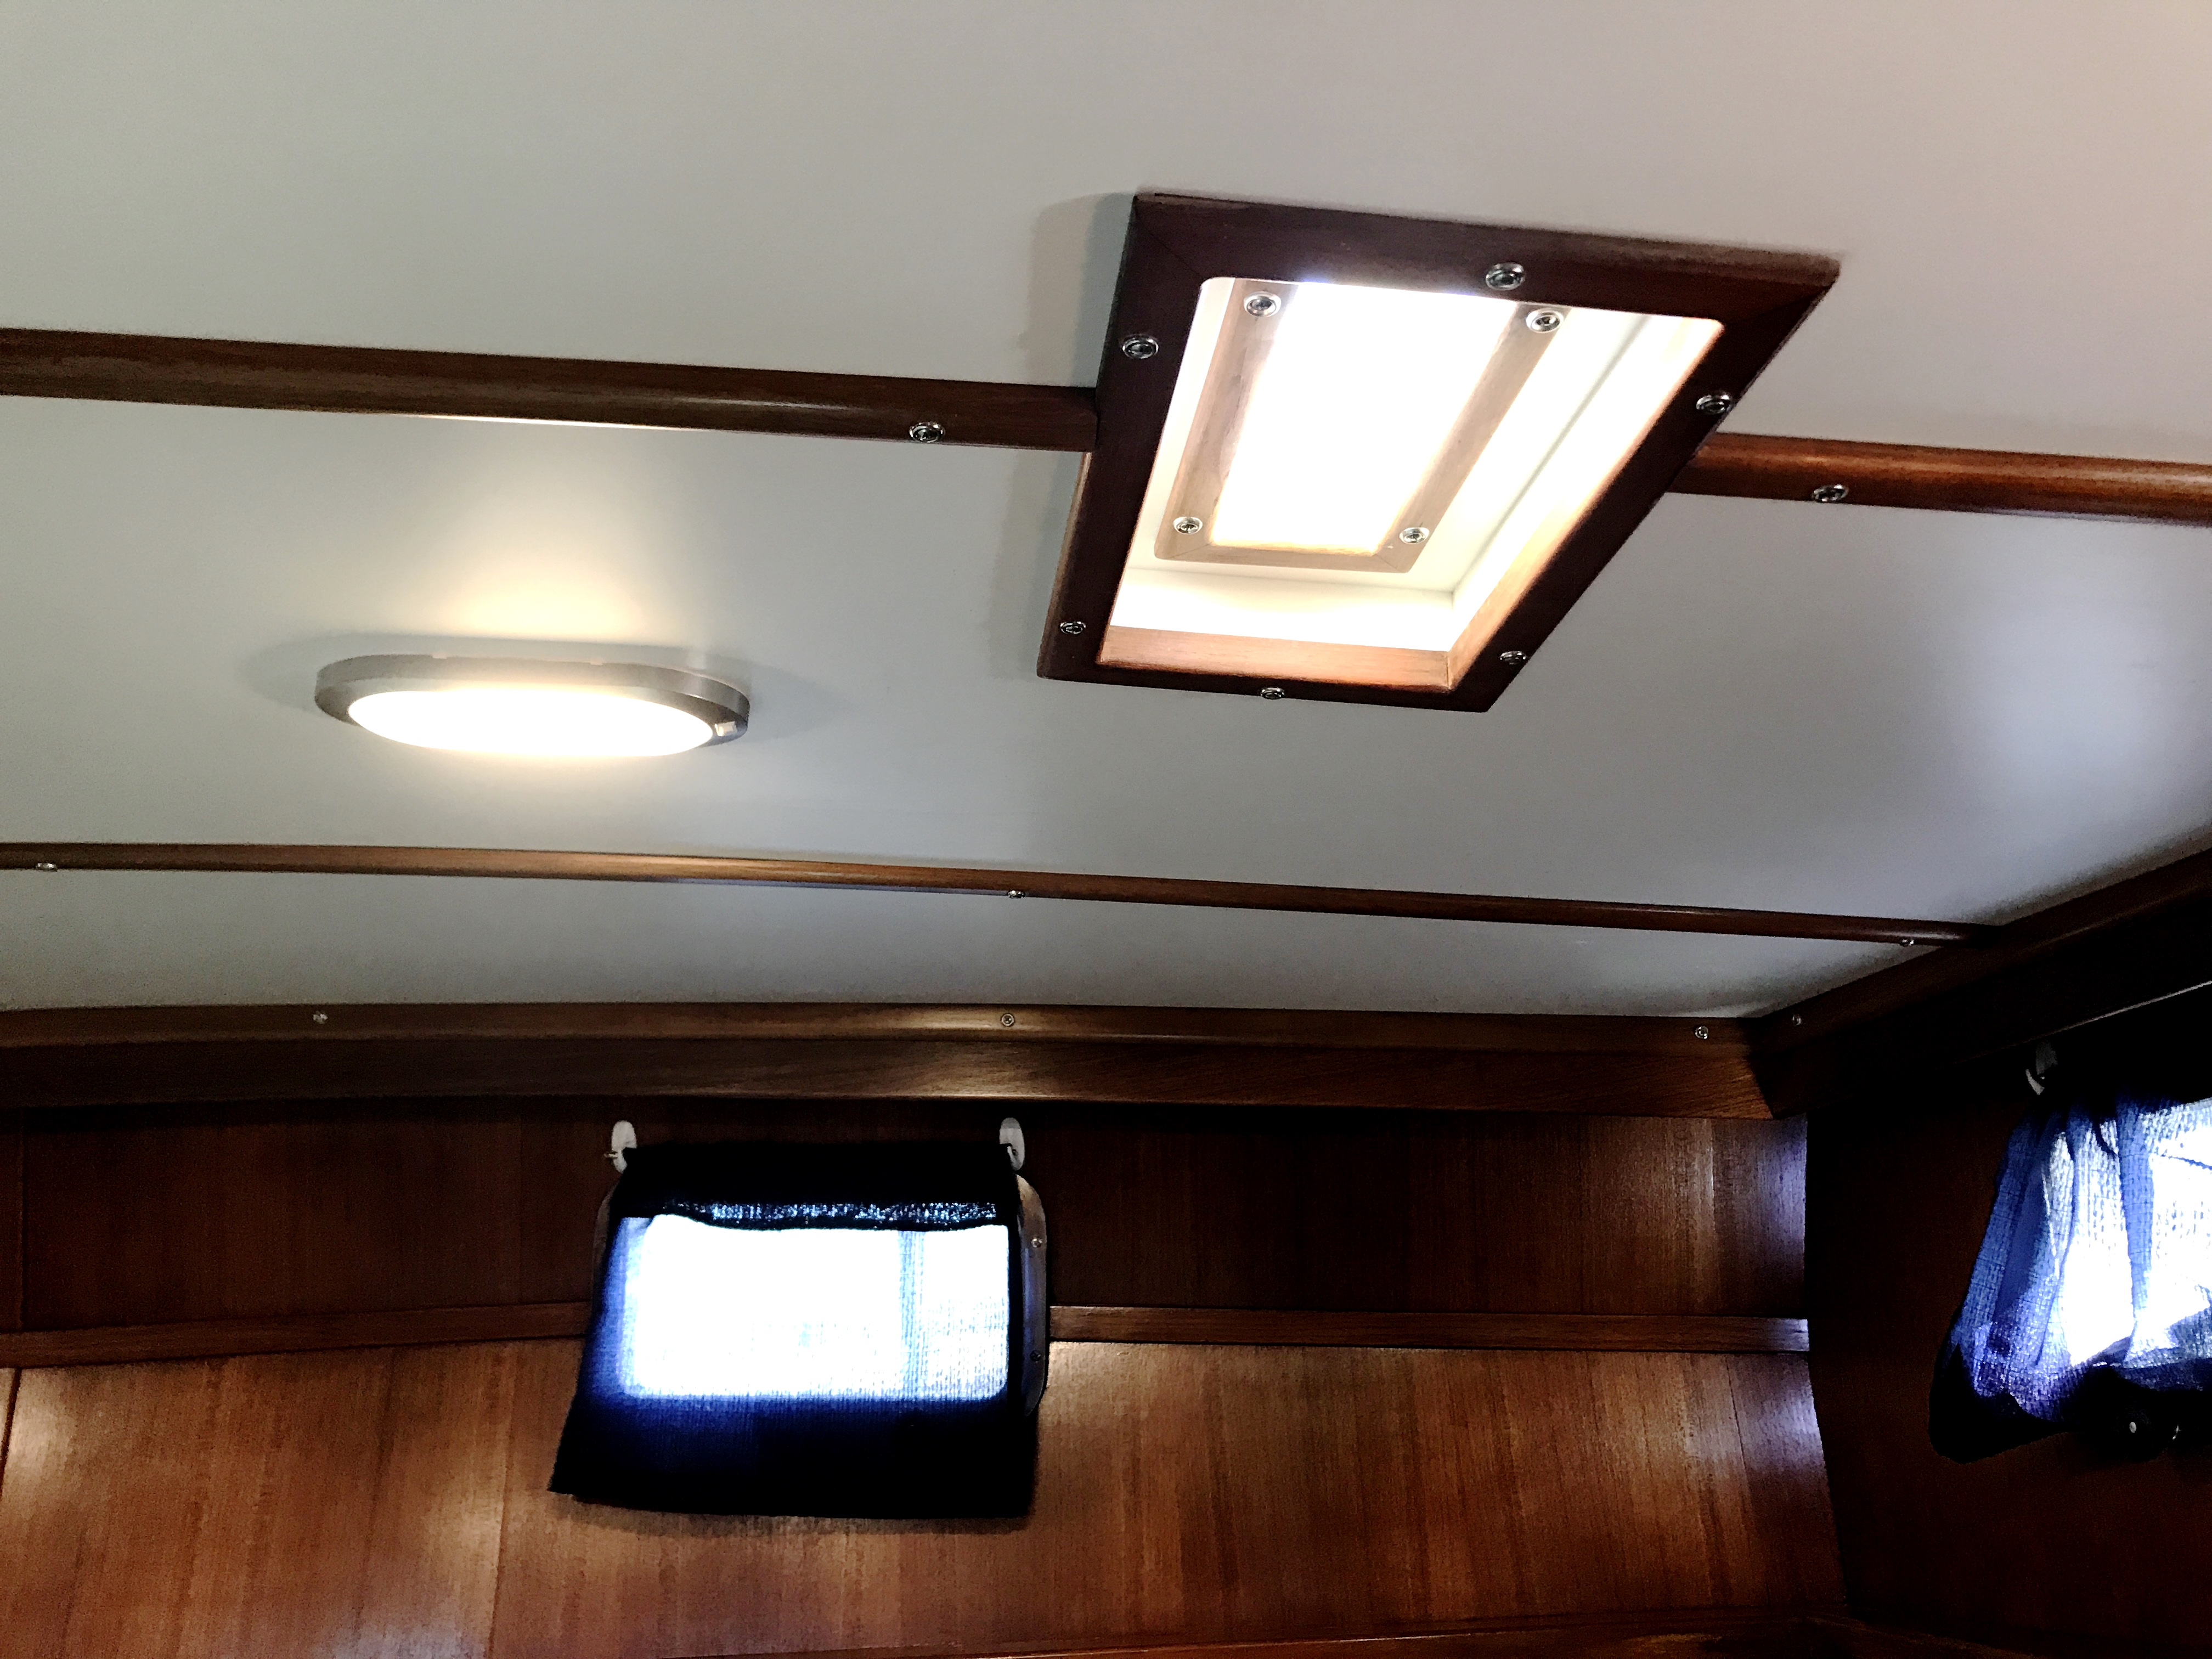 Sea Ranger SUNDECK - All new overhead in master stateroom